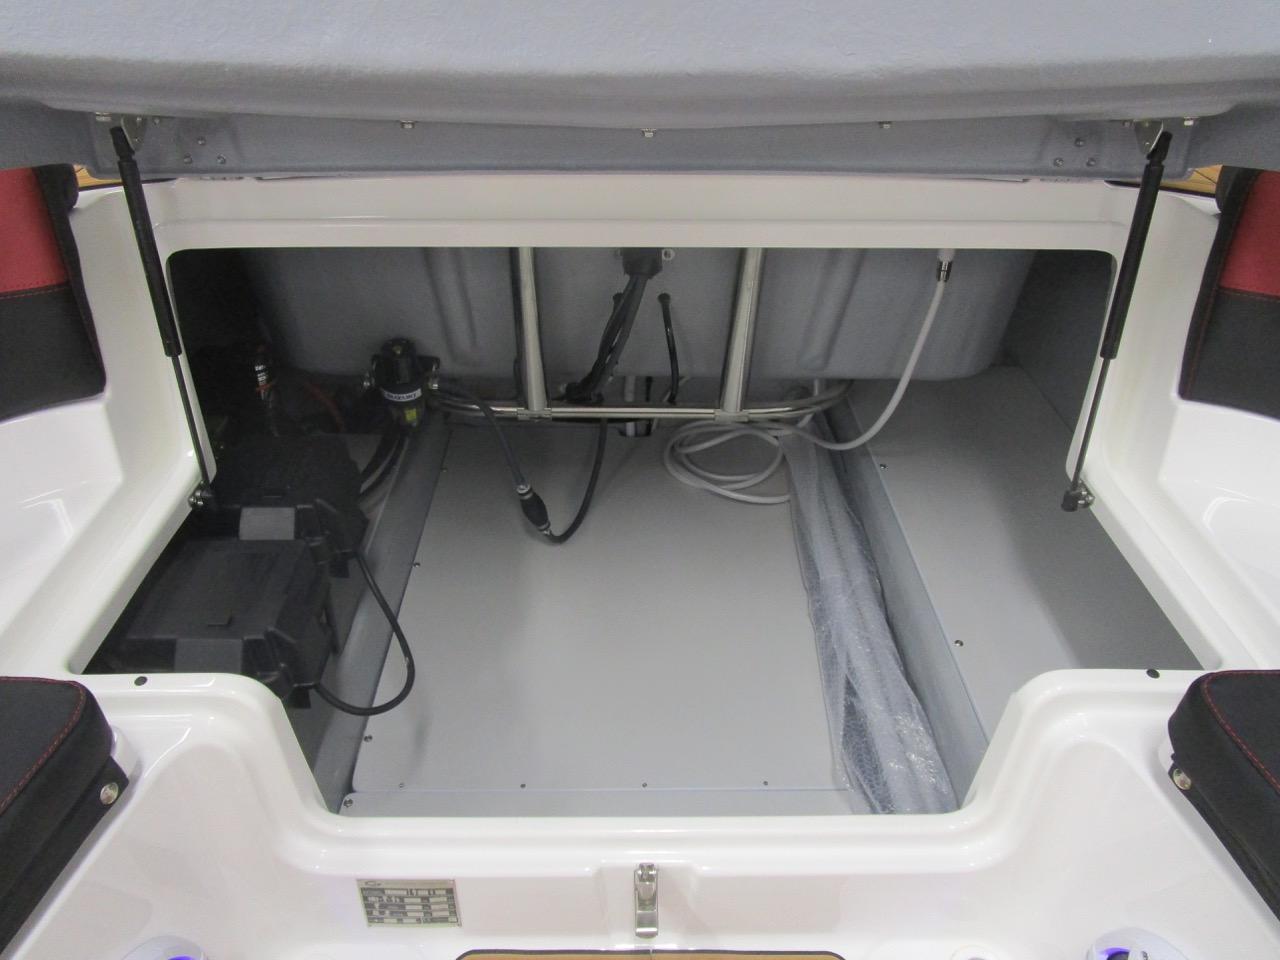 GRAND G850 RIB massive storage space under rear seat